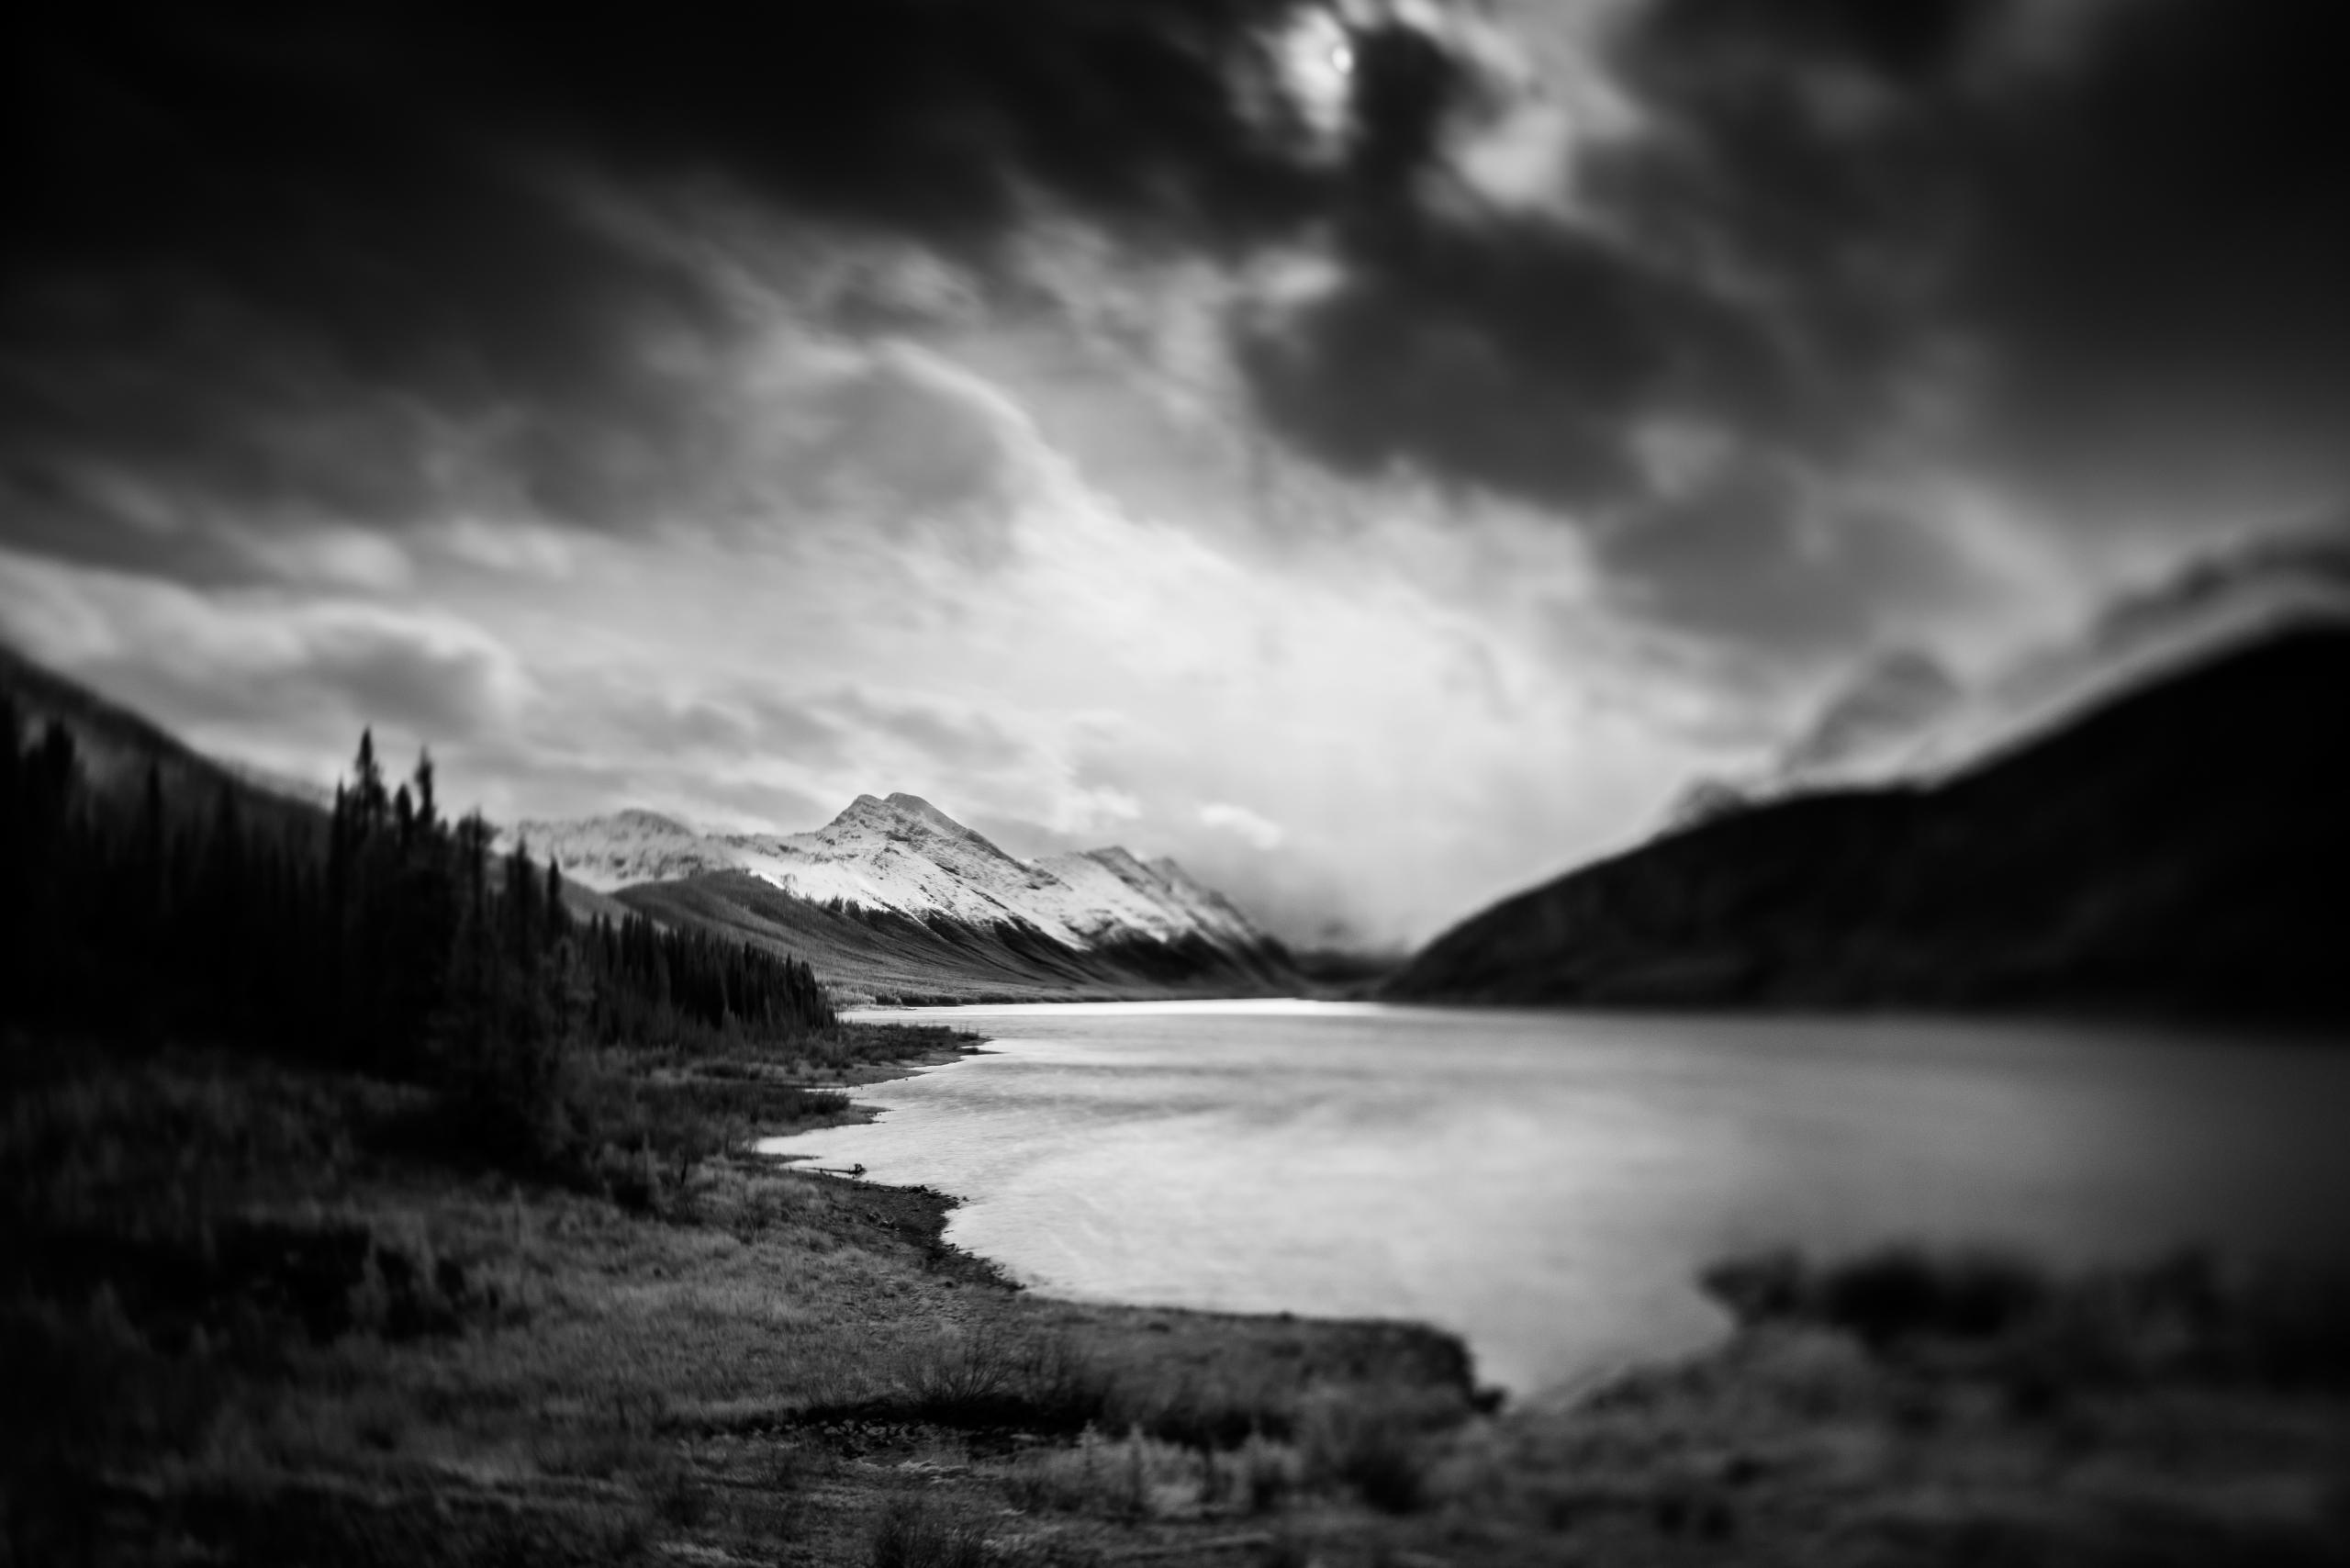 Alex Nirta, Spray Lakes, 2016